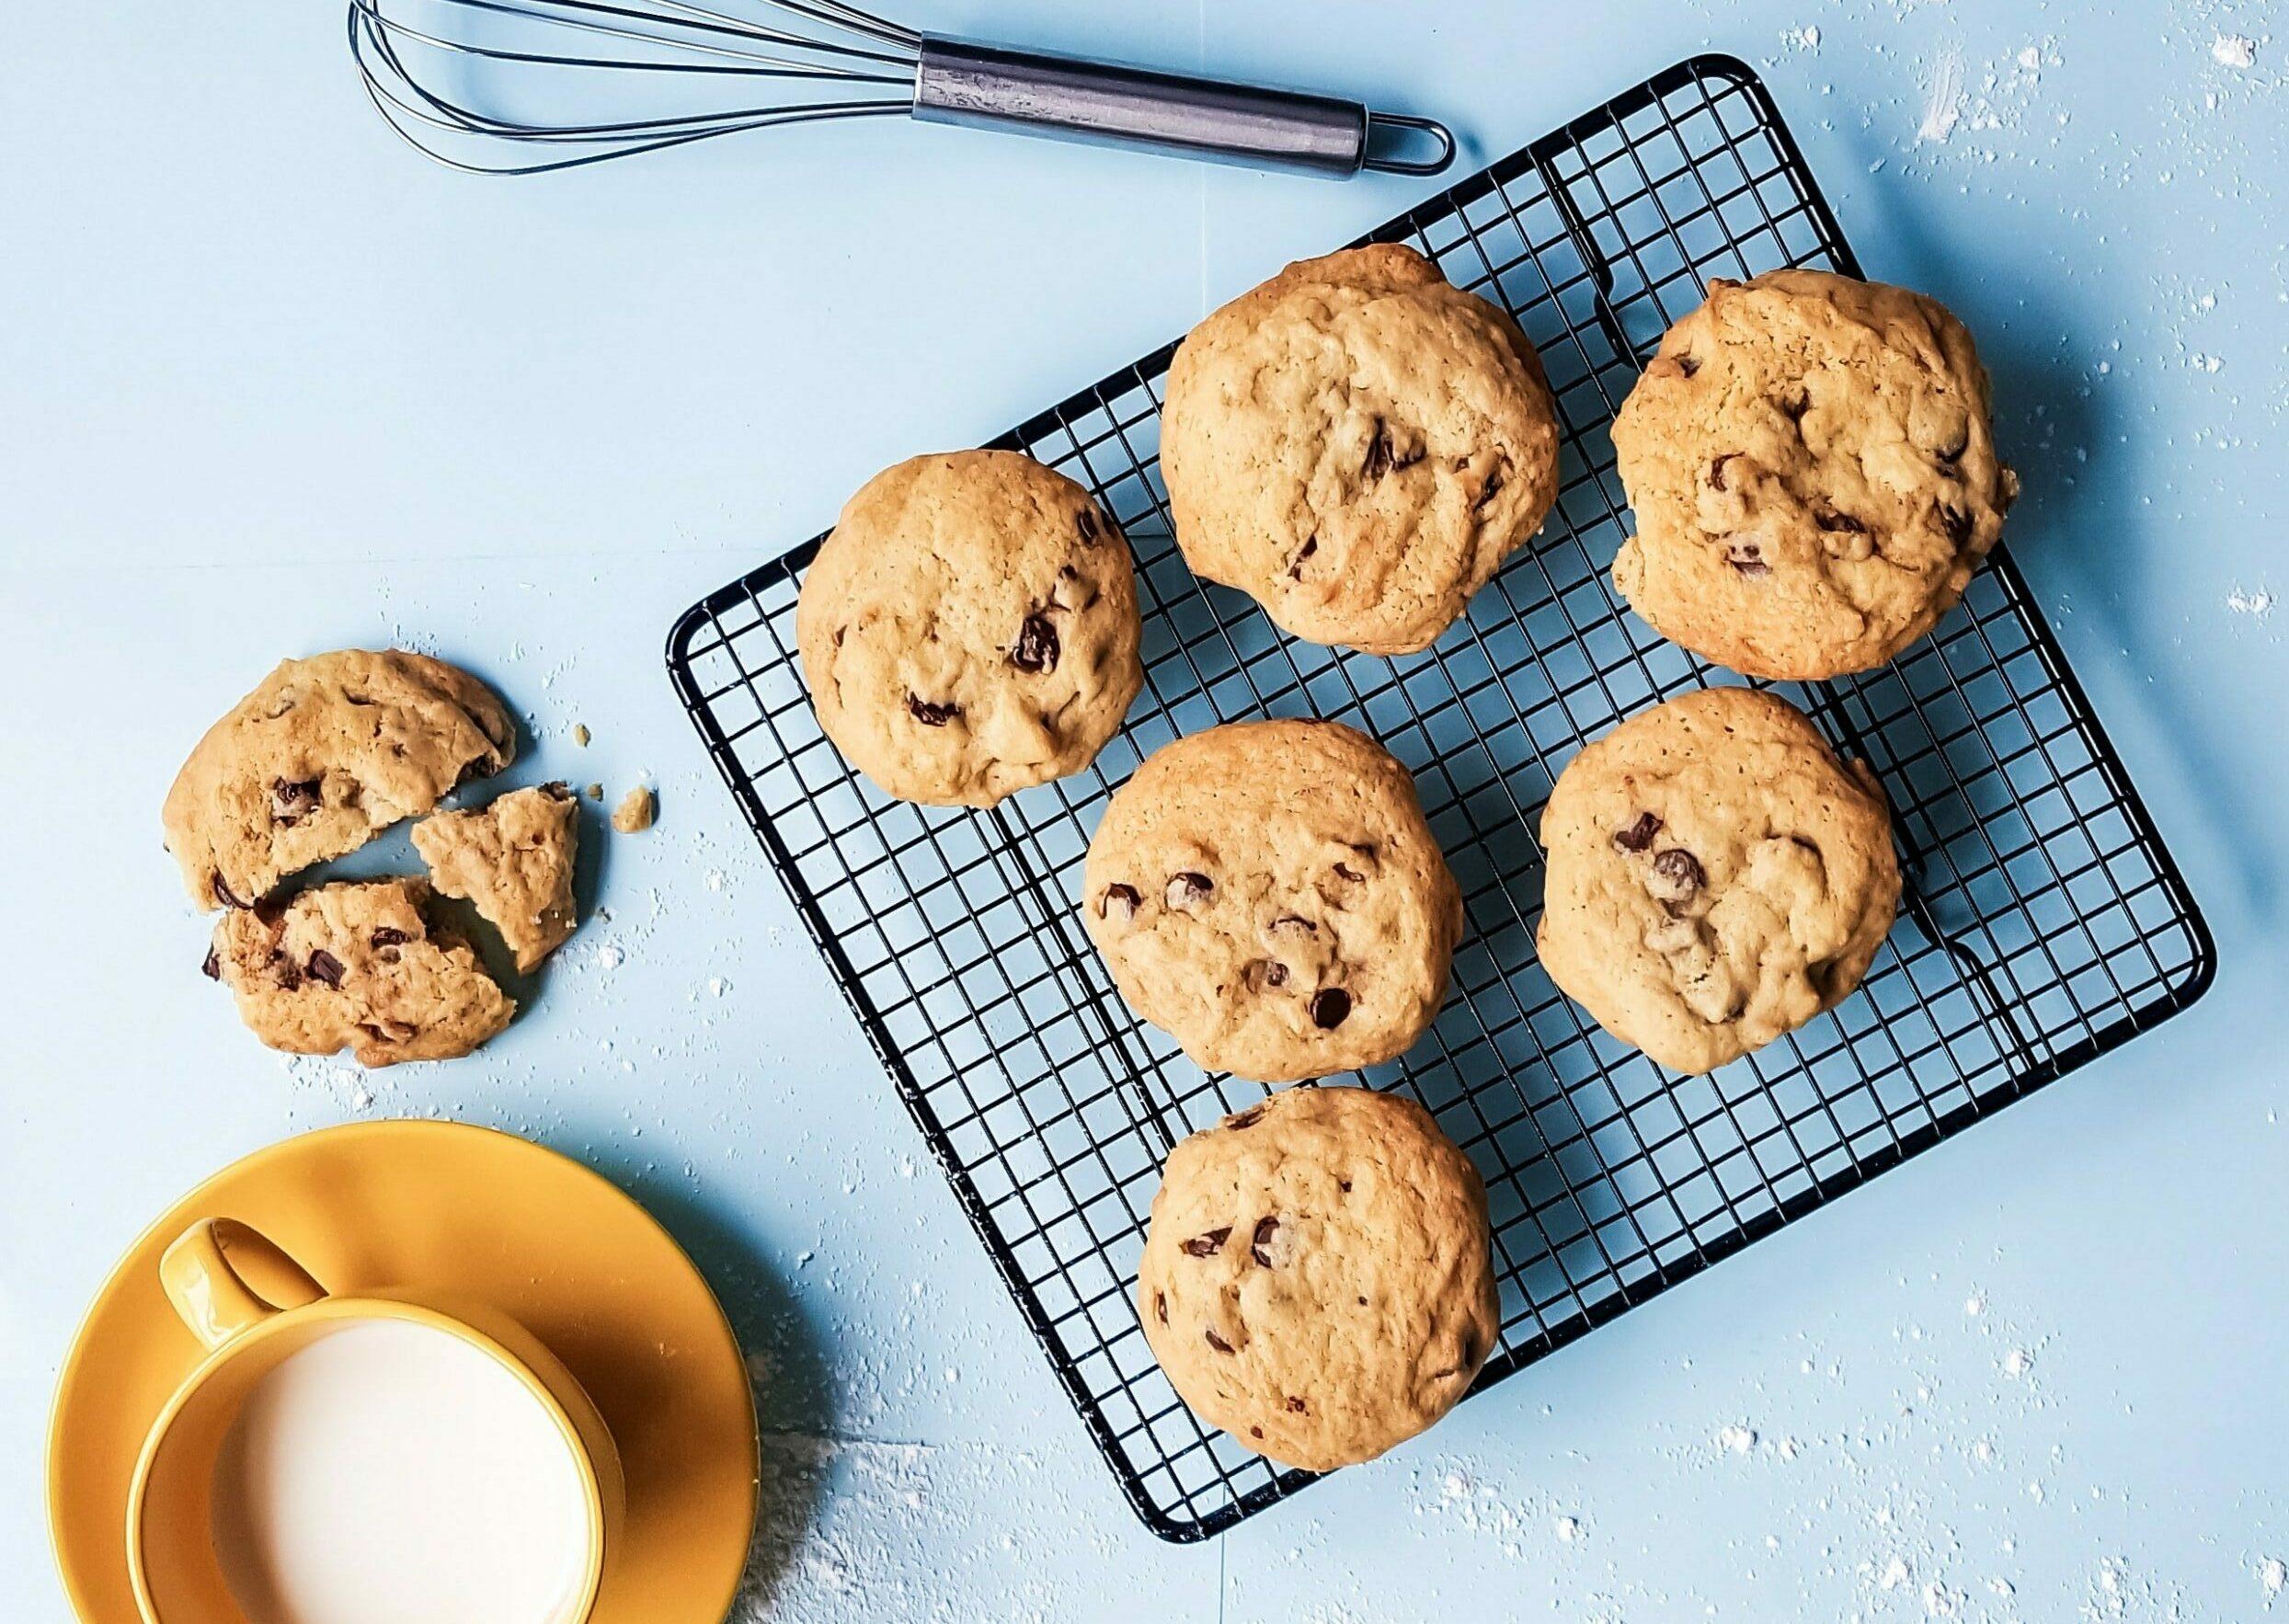 parenting cookies